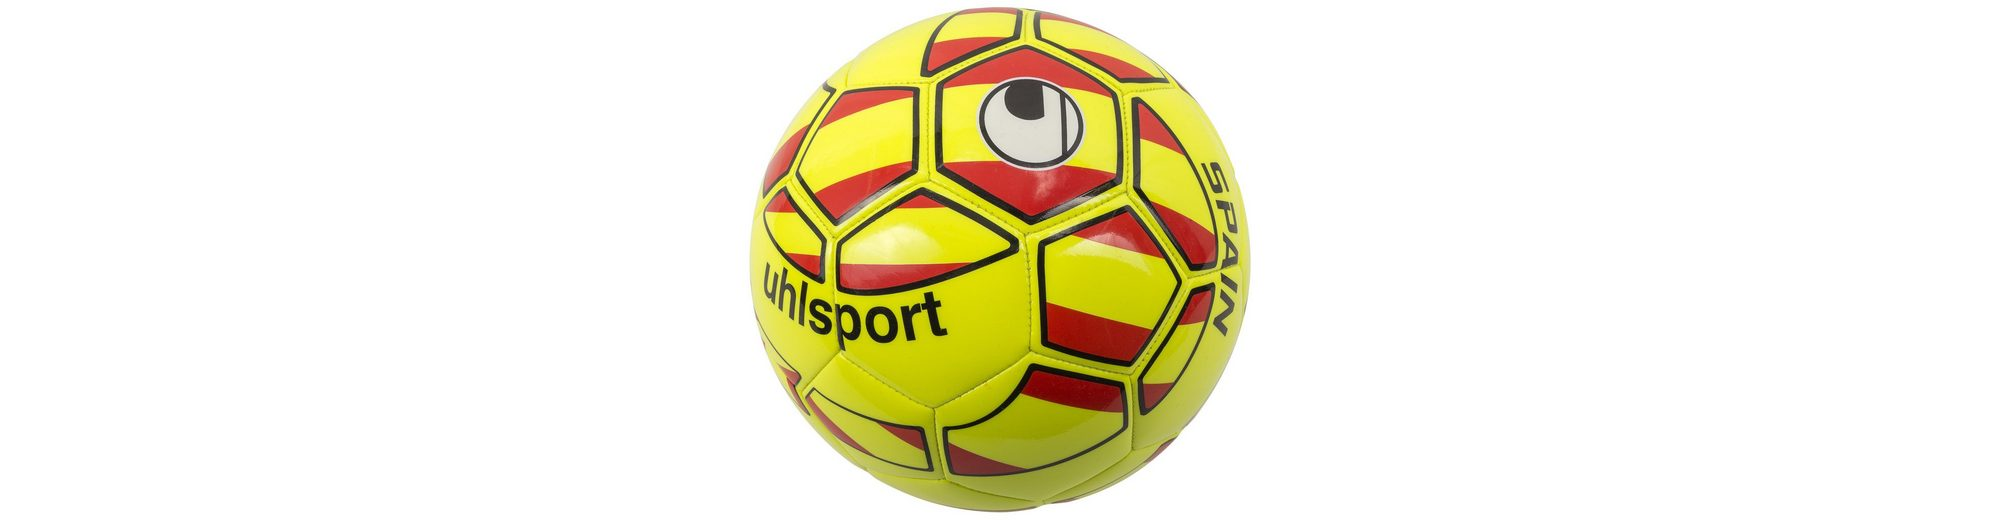 UHLSPORT Spanien Fußball